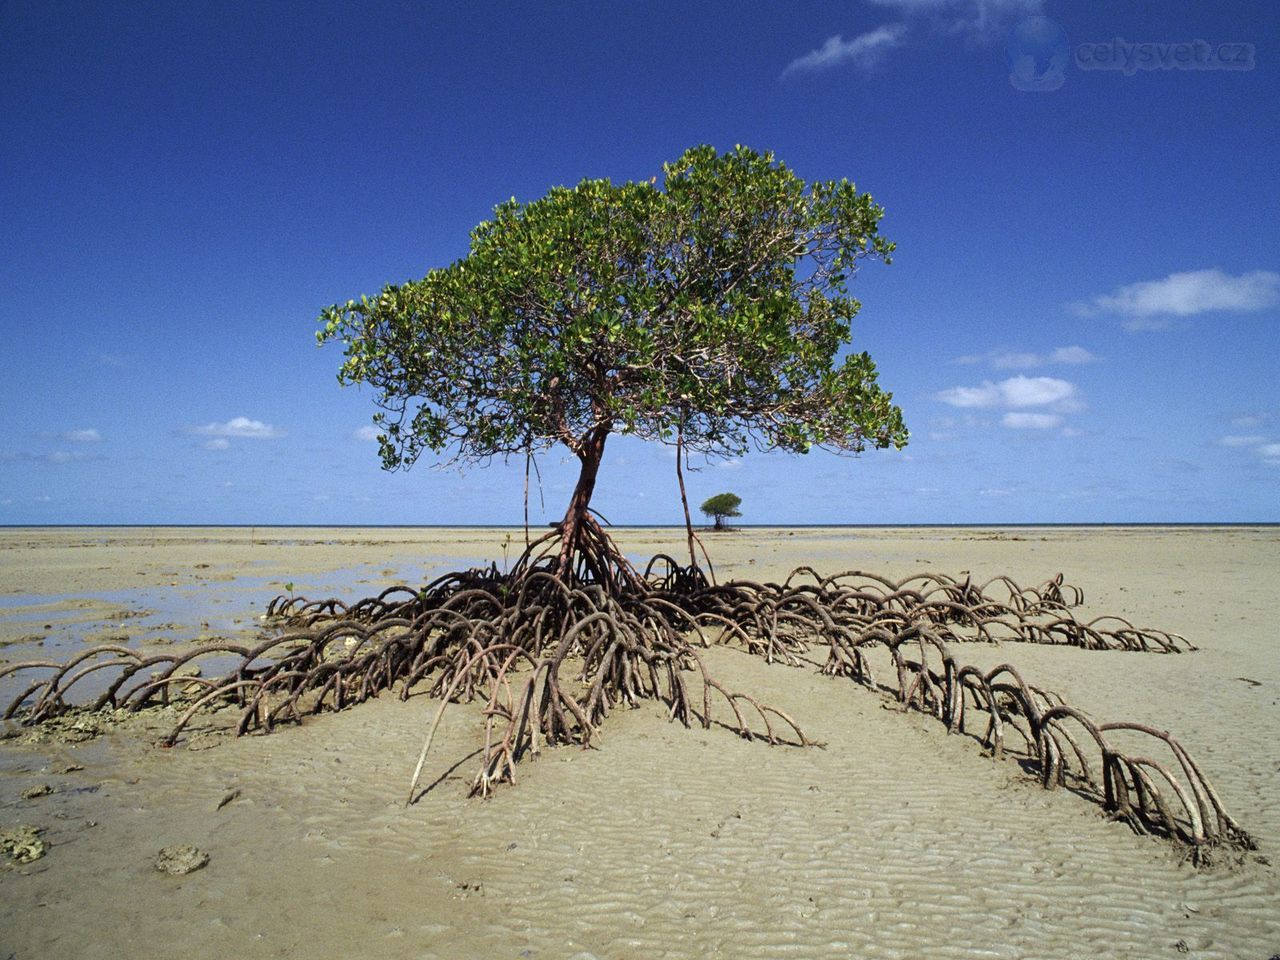 Mangrove Tree, Daintree National Park, Australia in 2019